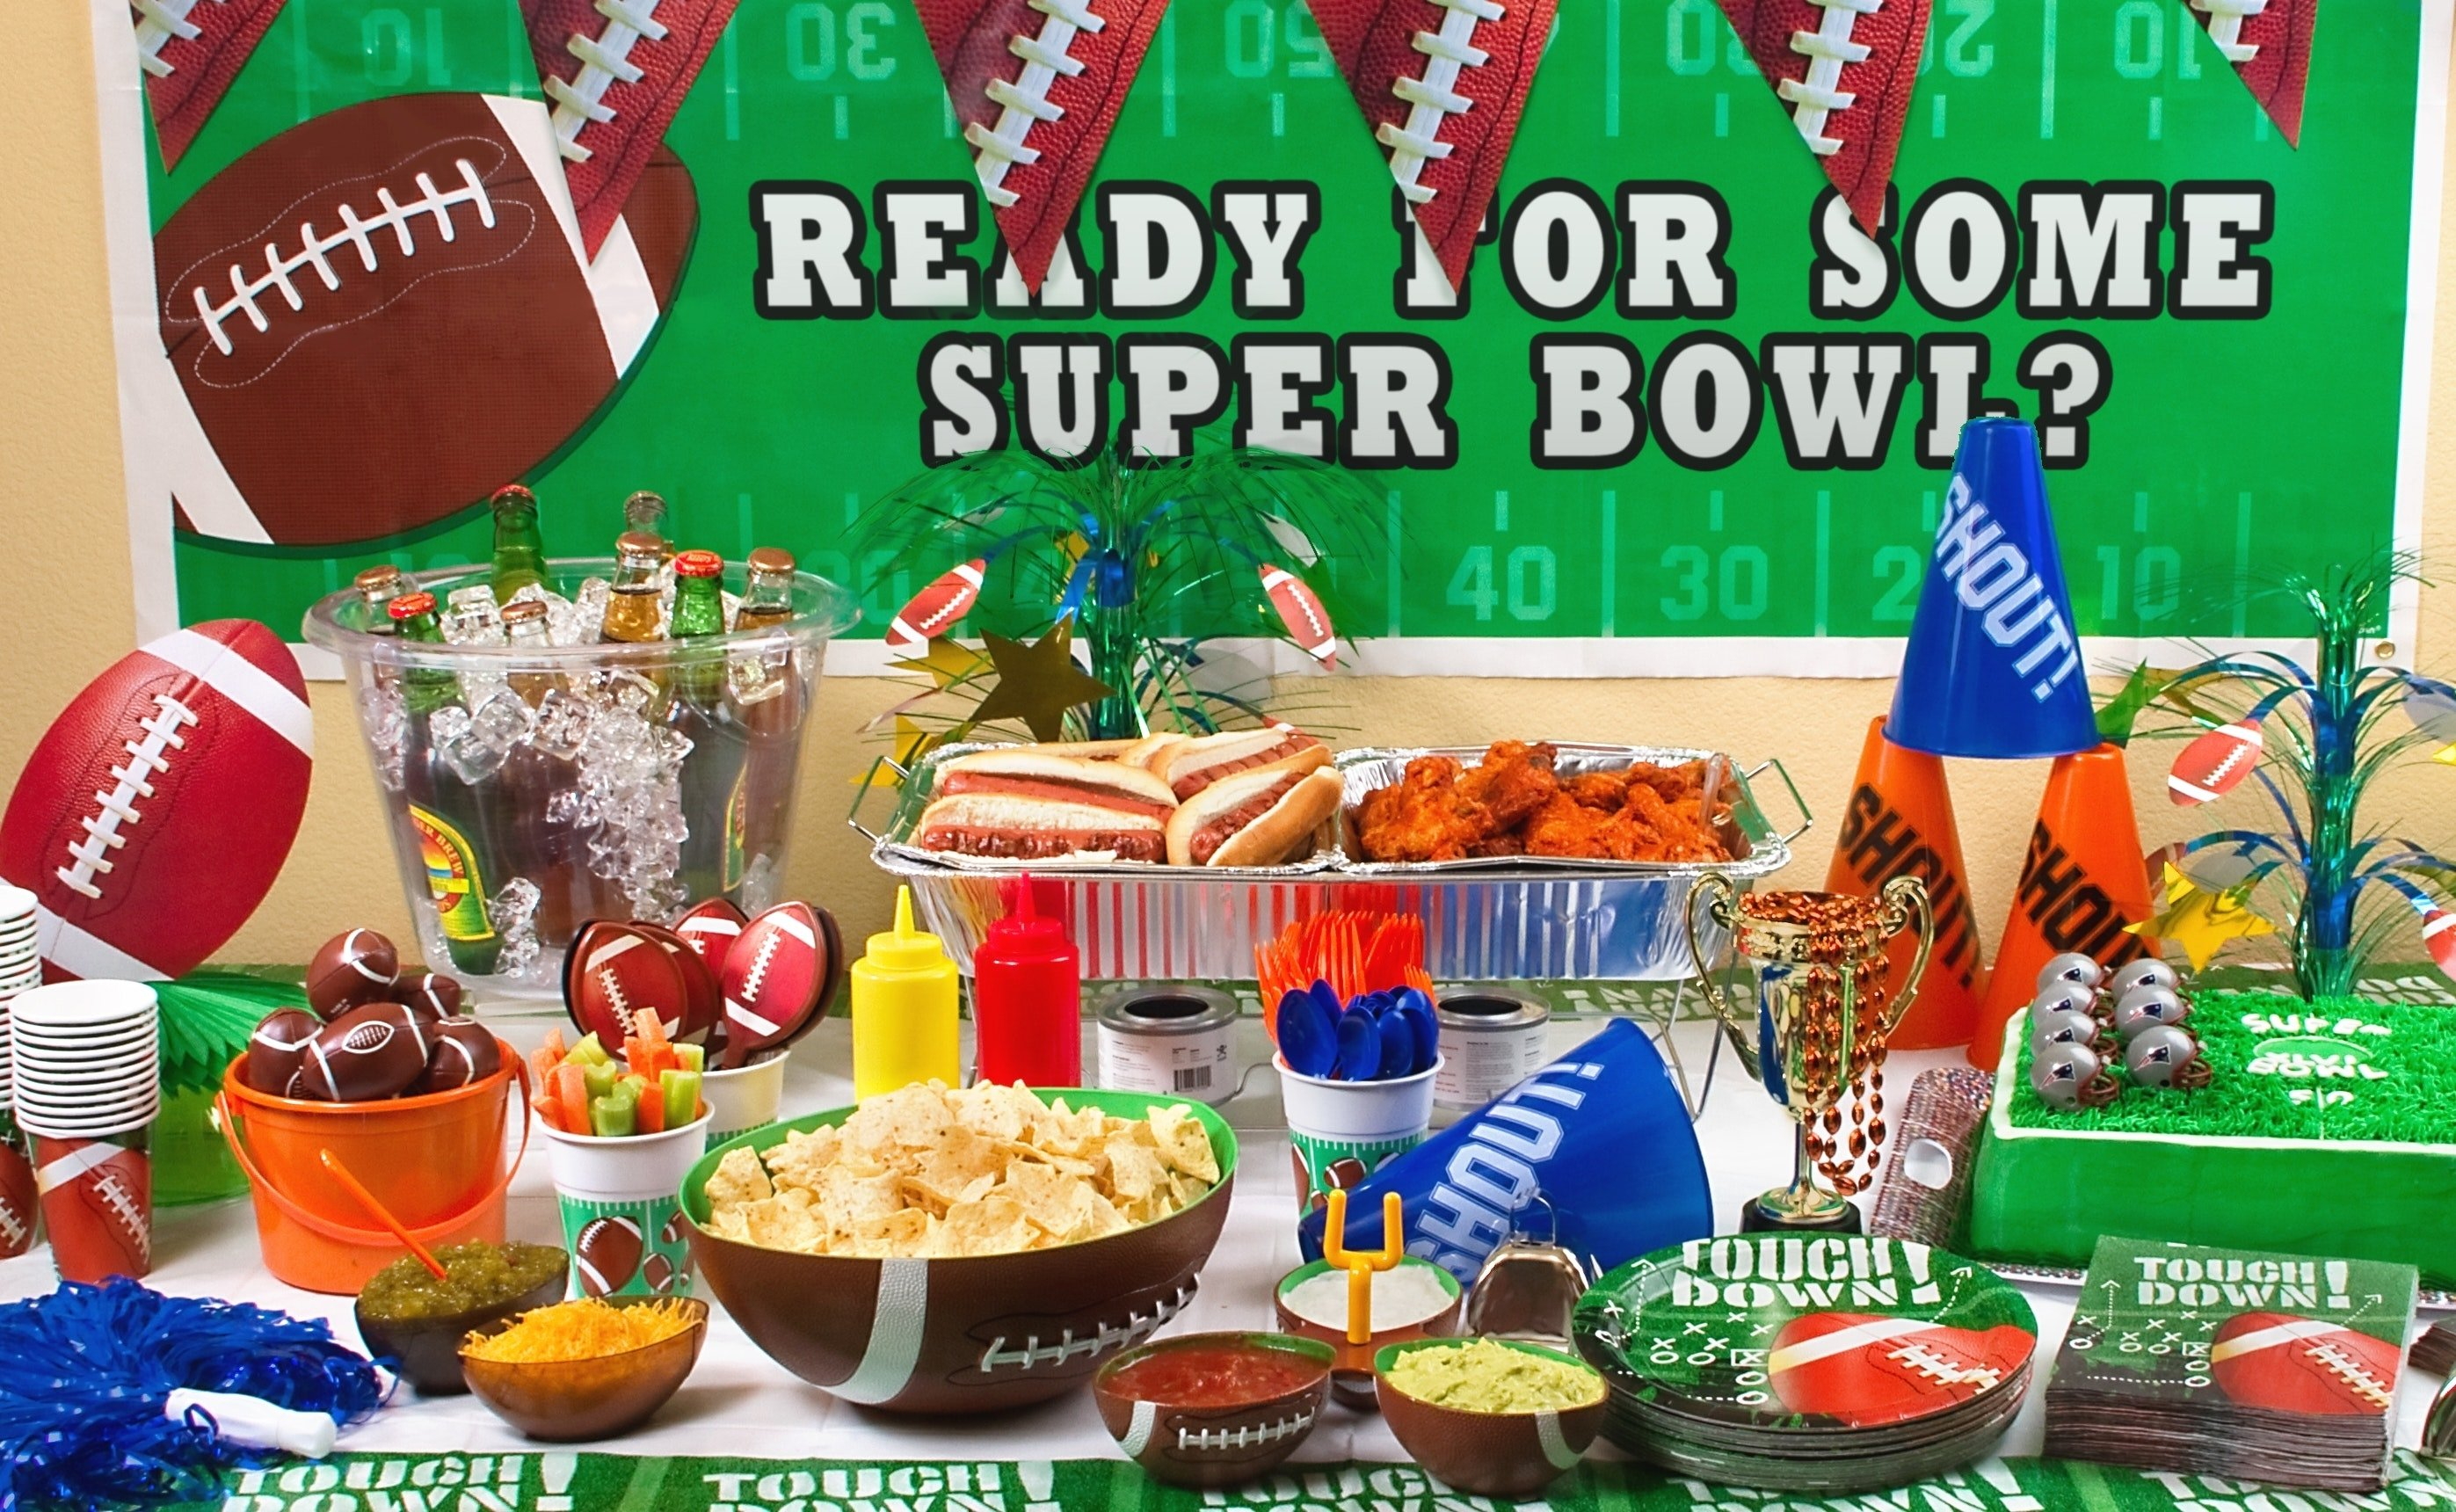 10 Amazing Super Bowl Party Decorating Ideas super bowl party decorations eye decorating ideas bowlparty abuse 2020